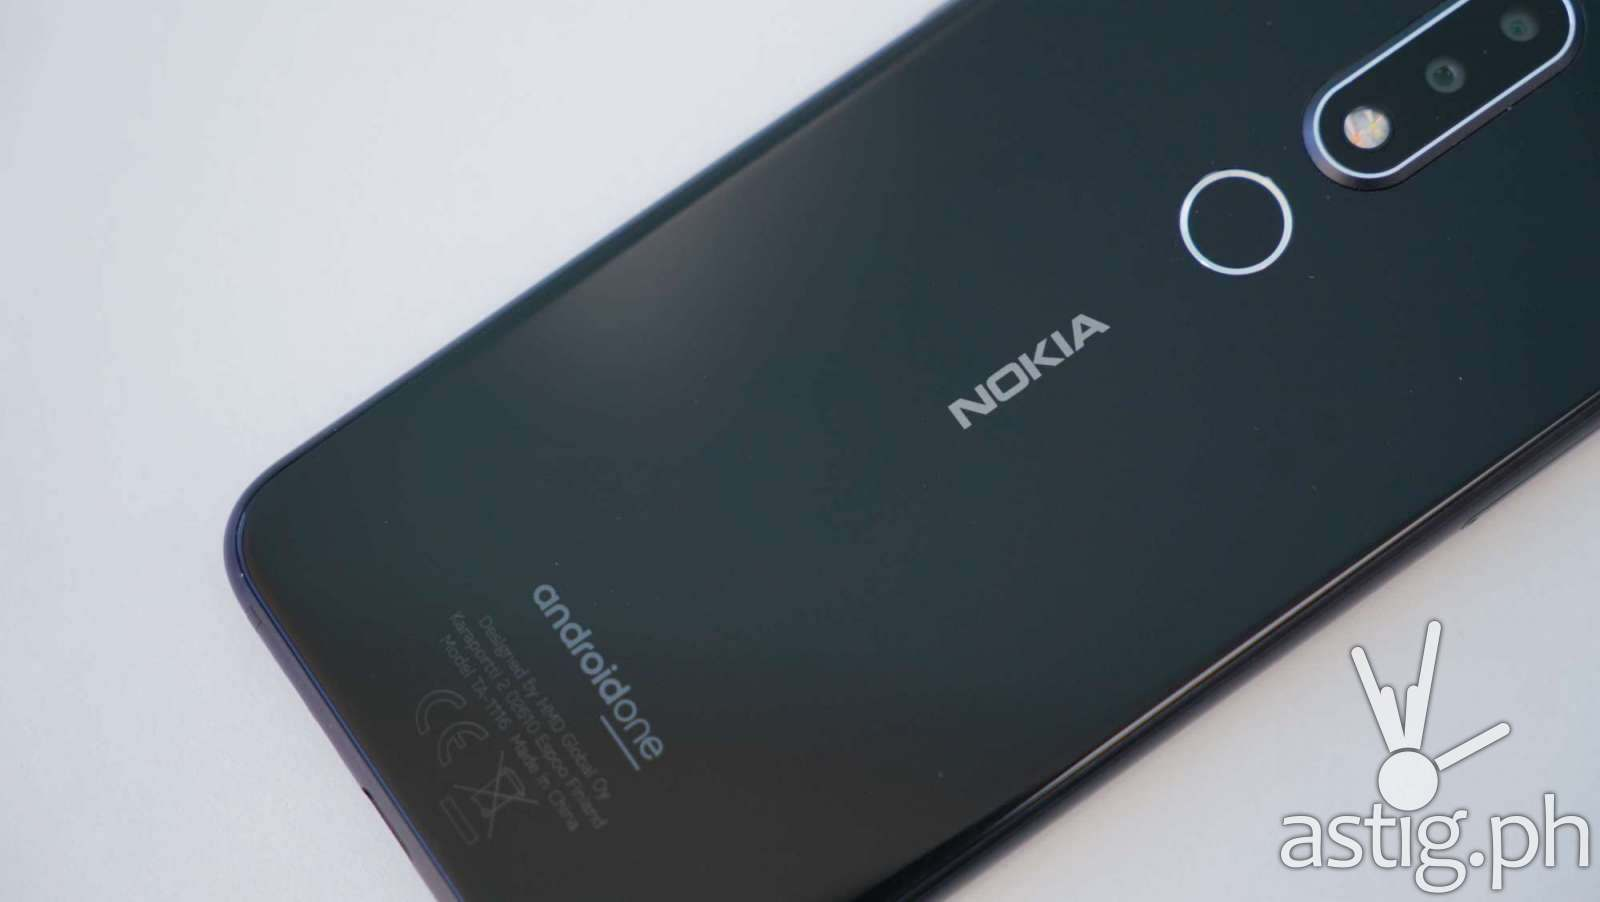 AndroidOne - Nokia 6.1 Plus (Philippines)